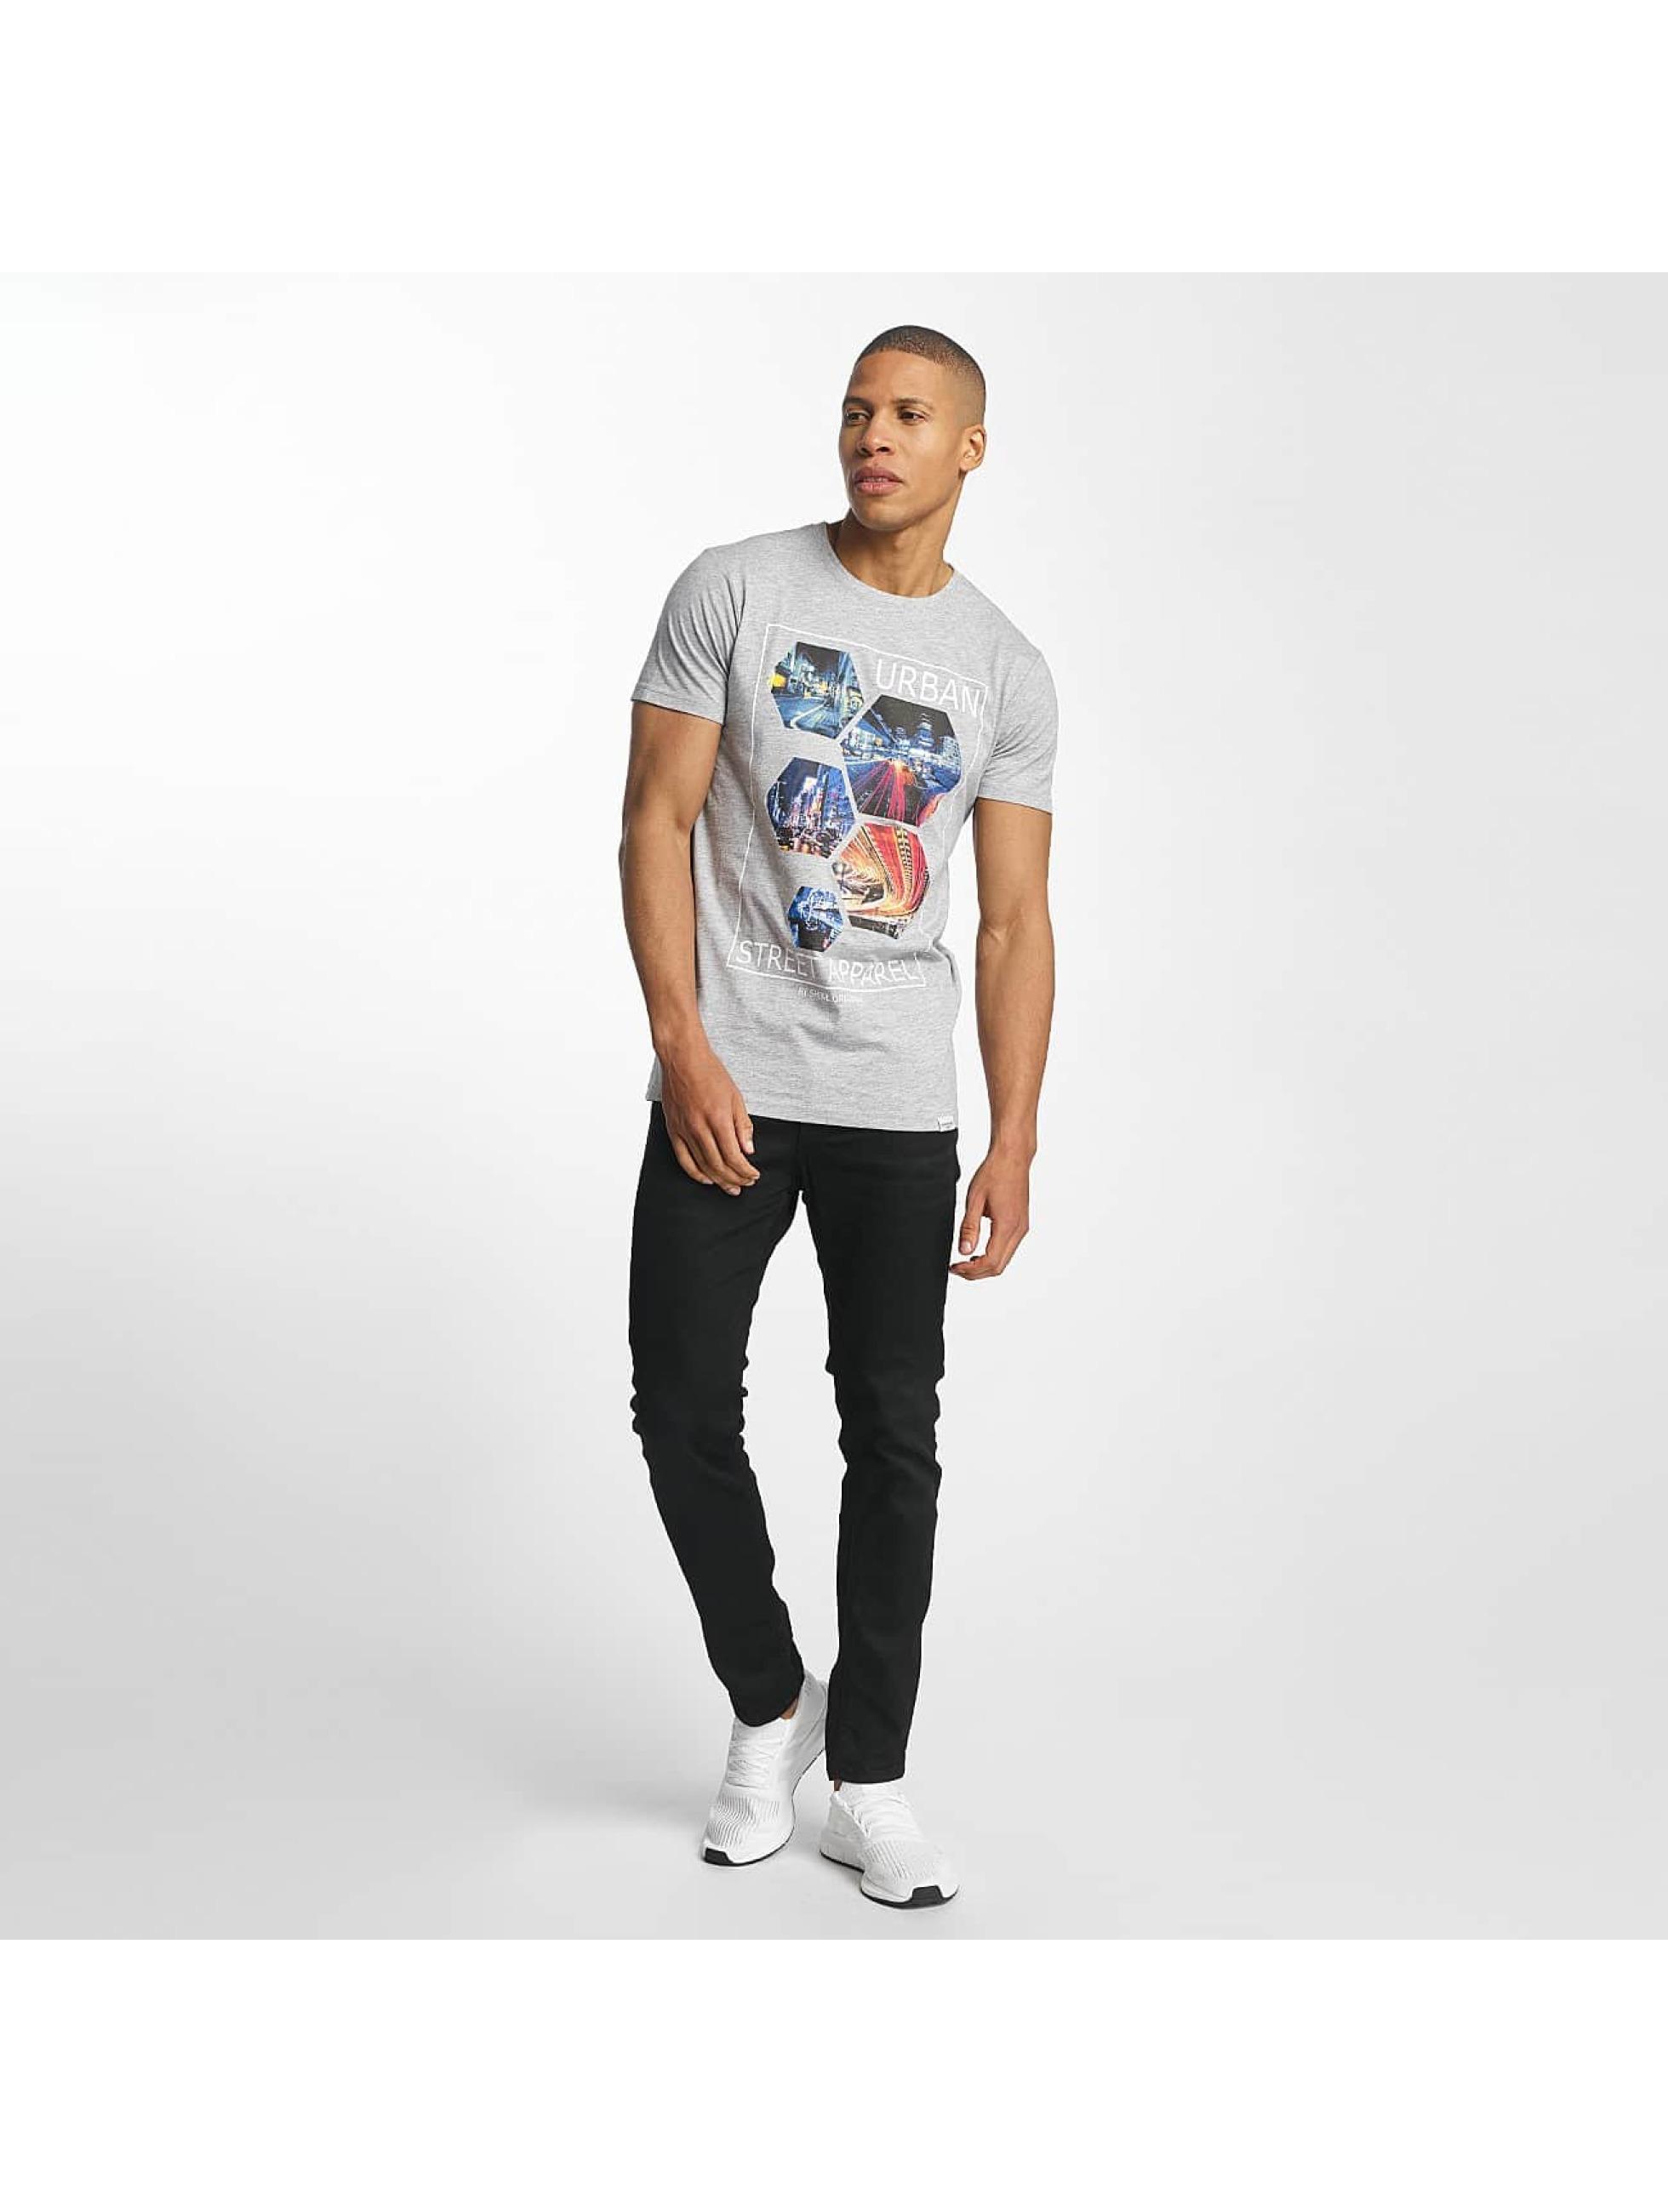 SHINE Original t-shirt Barret Photo Print grijs